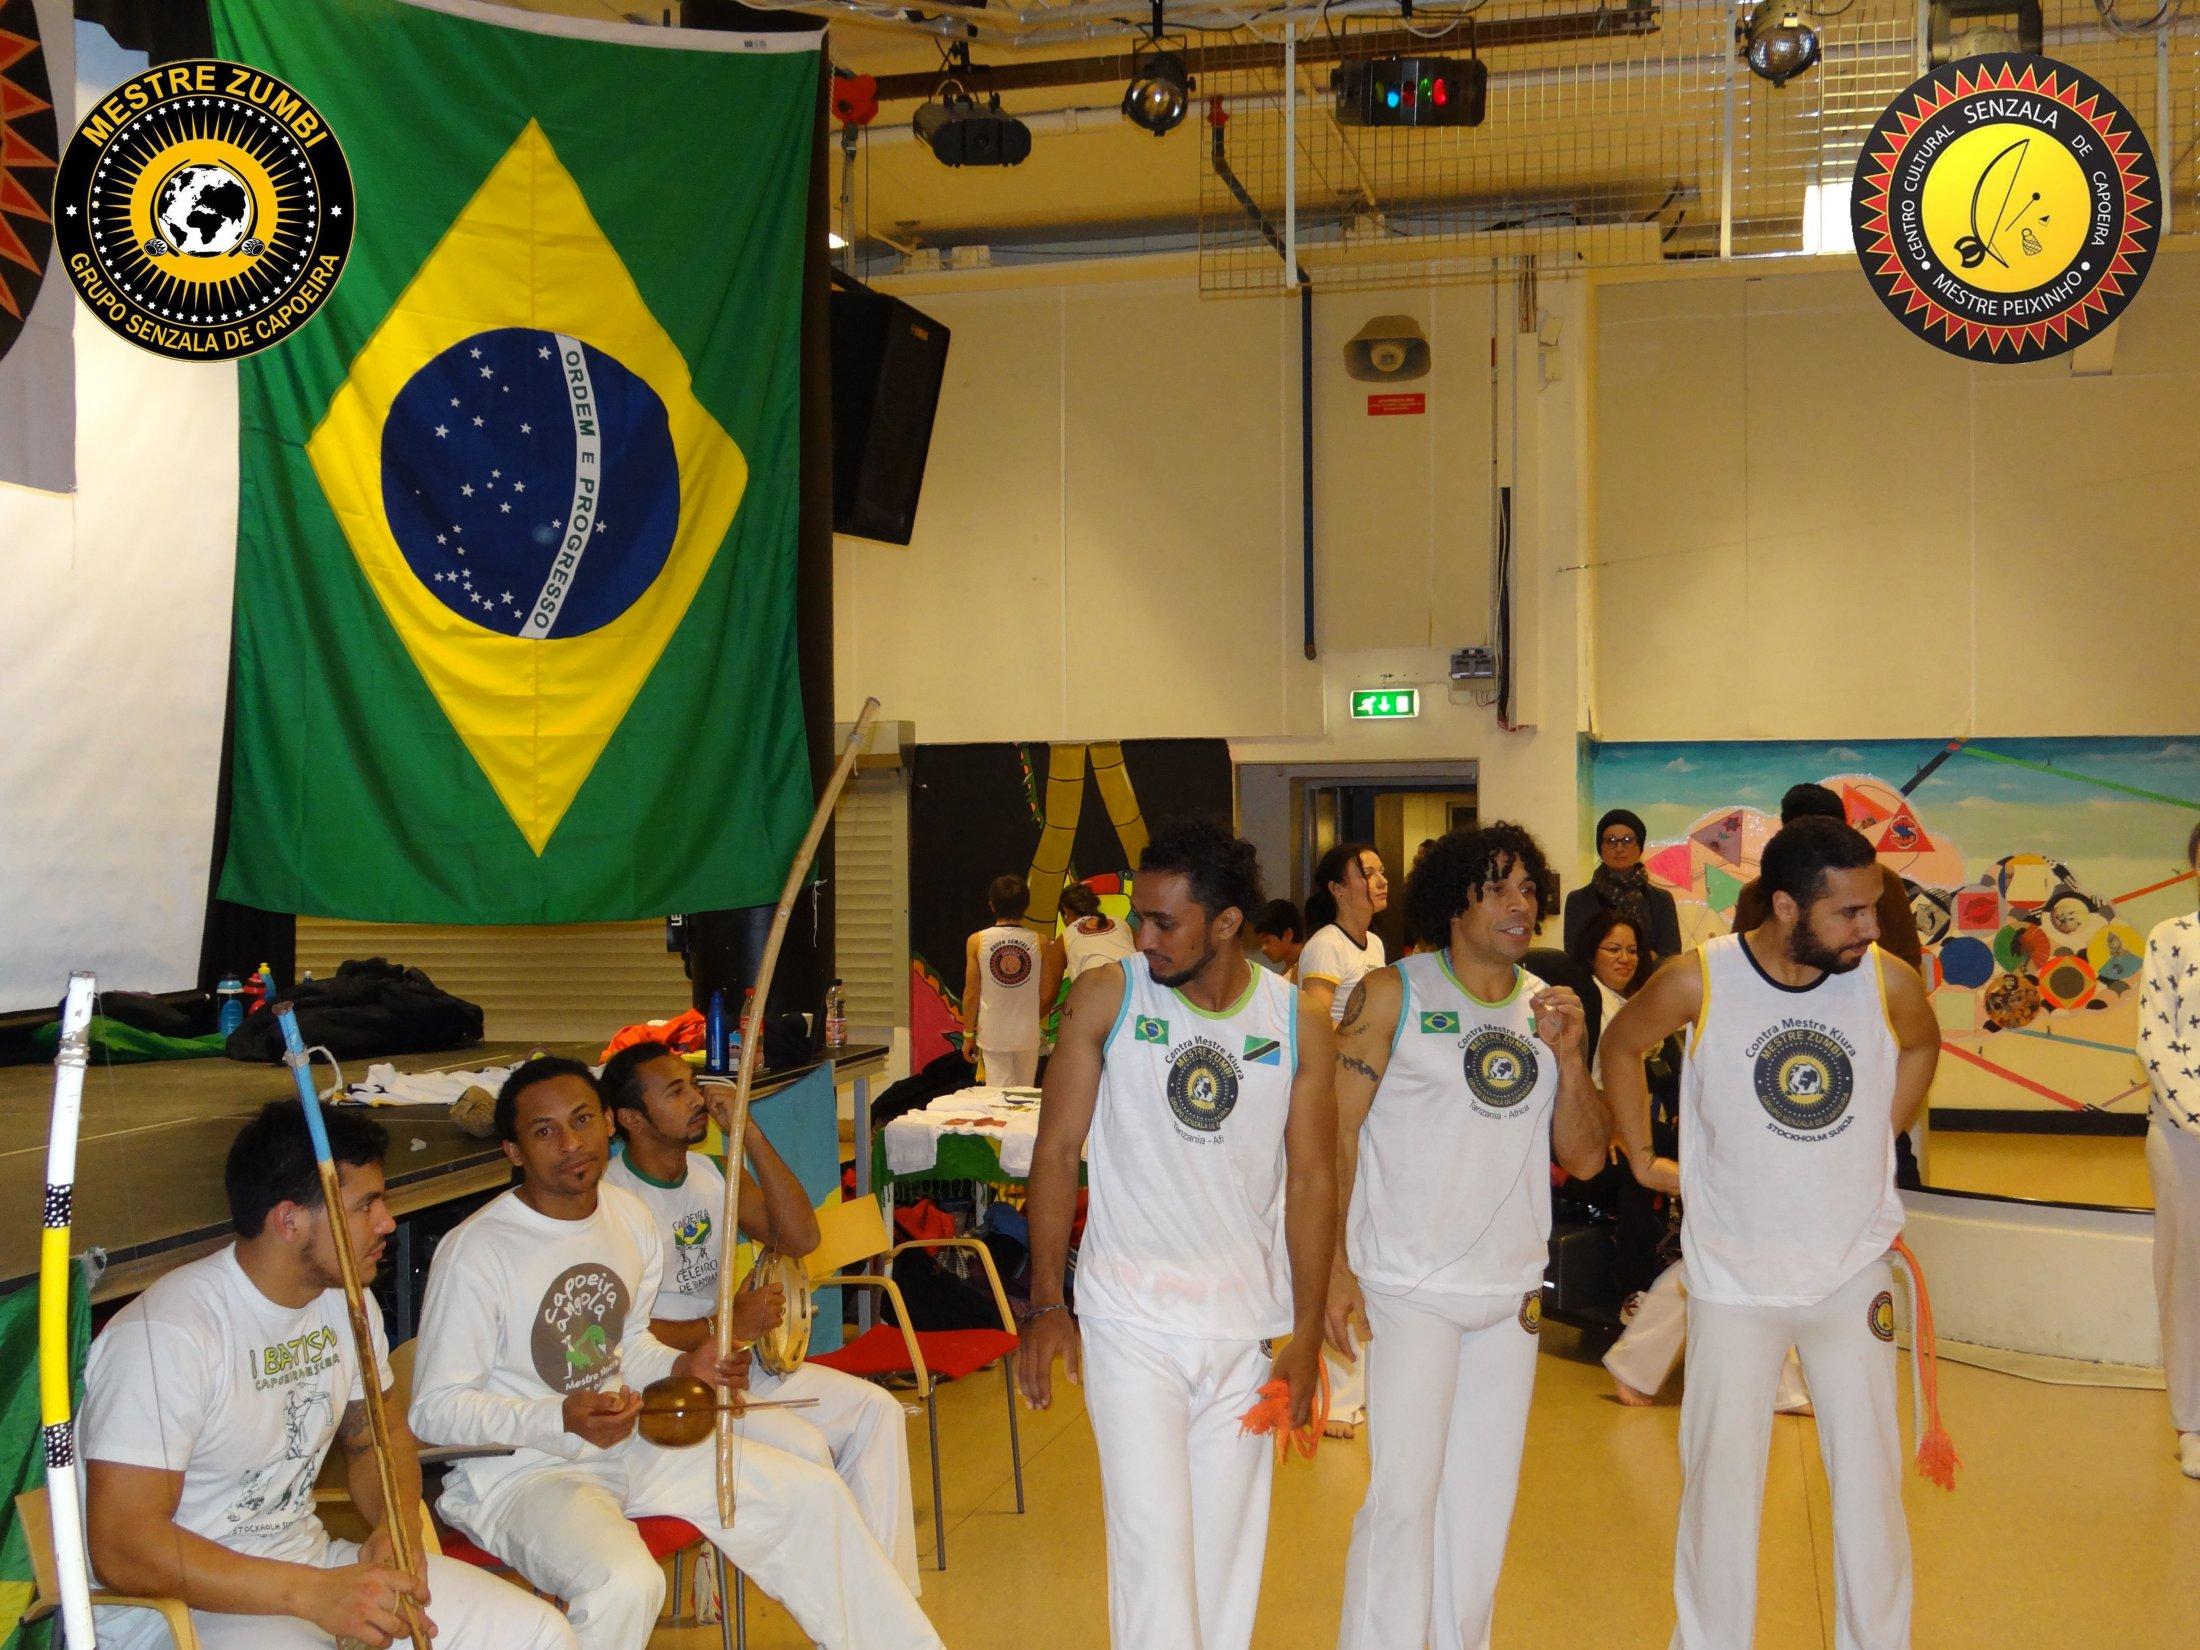 2013-12-14 - Capoeira 123